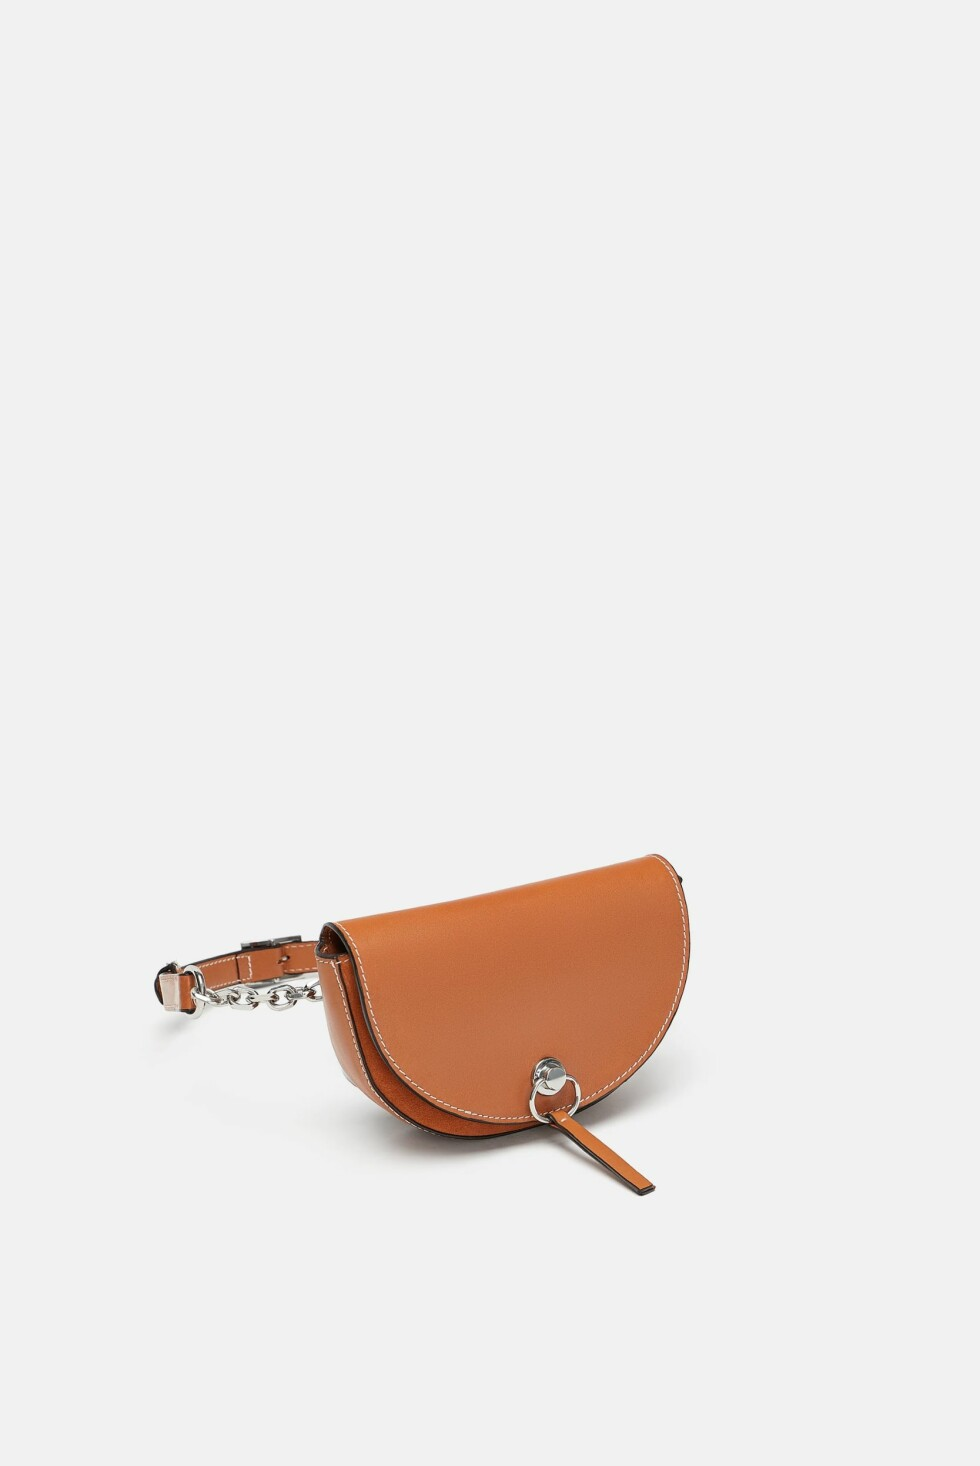 Rumpetaske fra Zara |560,-| https://www.zara.com/no/no/kombinert-rumpetaske-i-skinn-p15676304.html?v1=6963603&v2=1074708